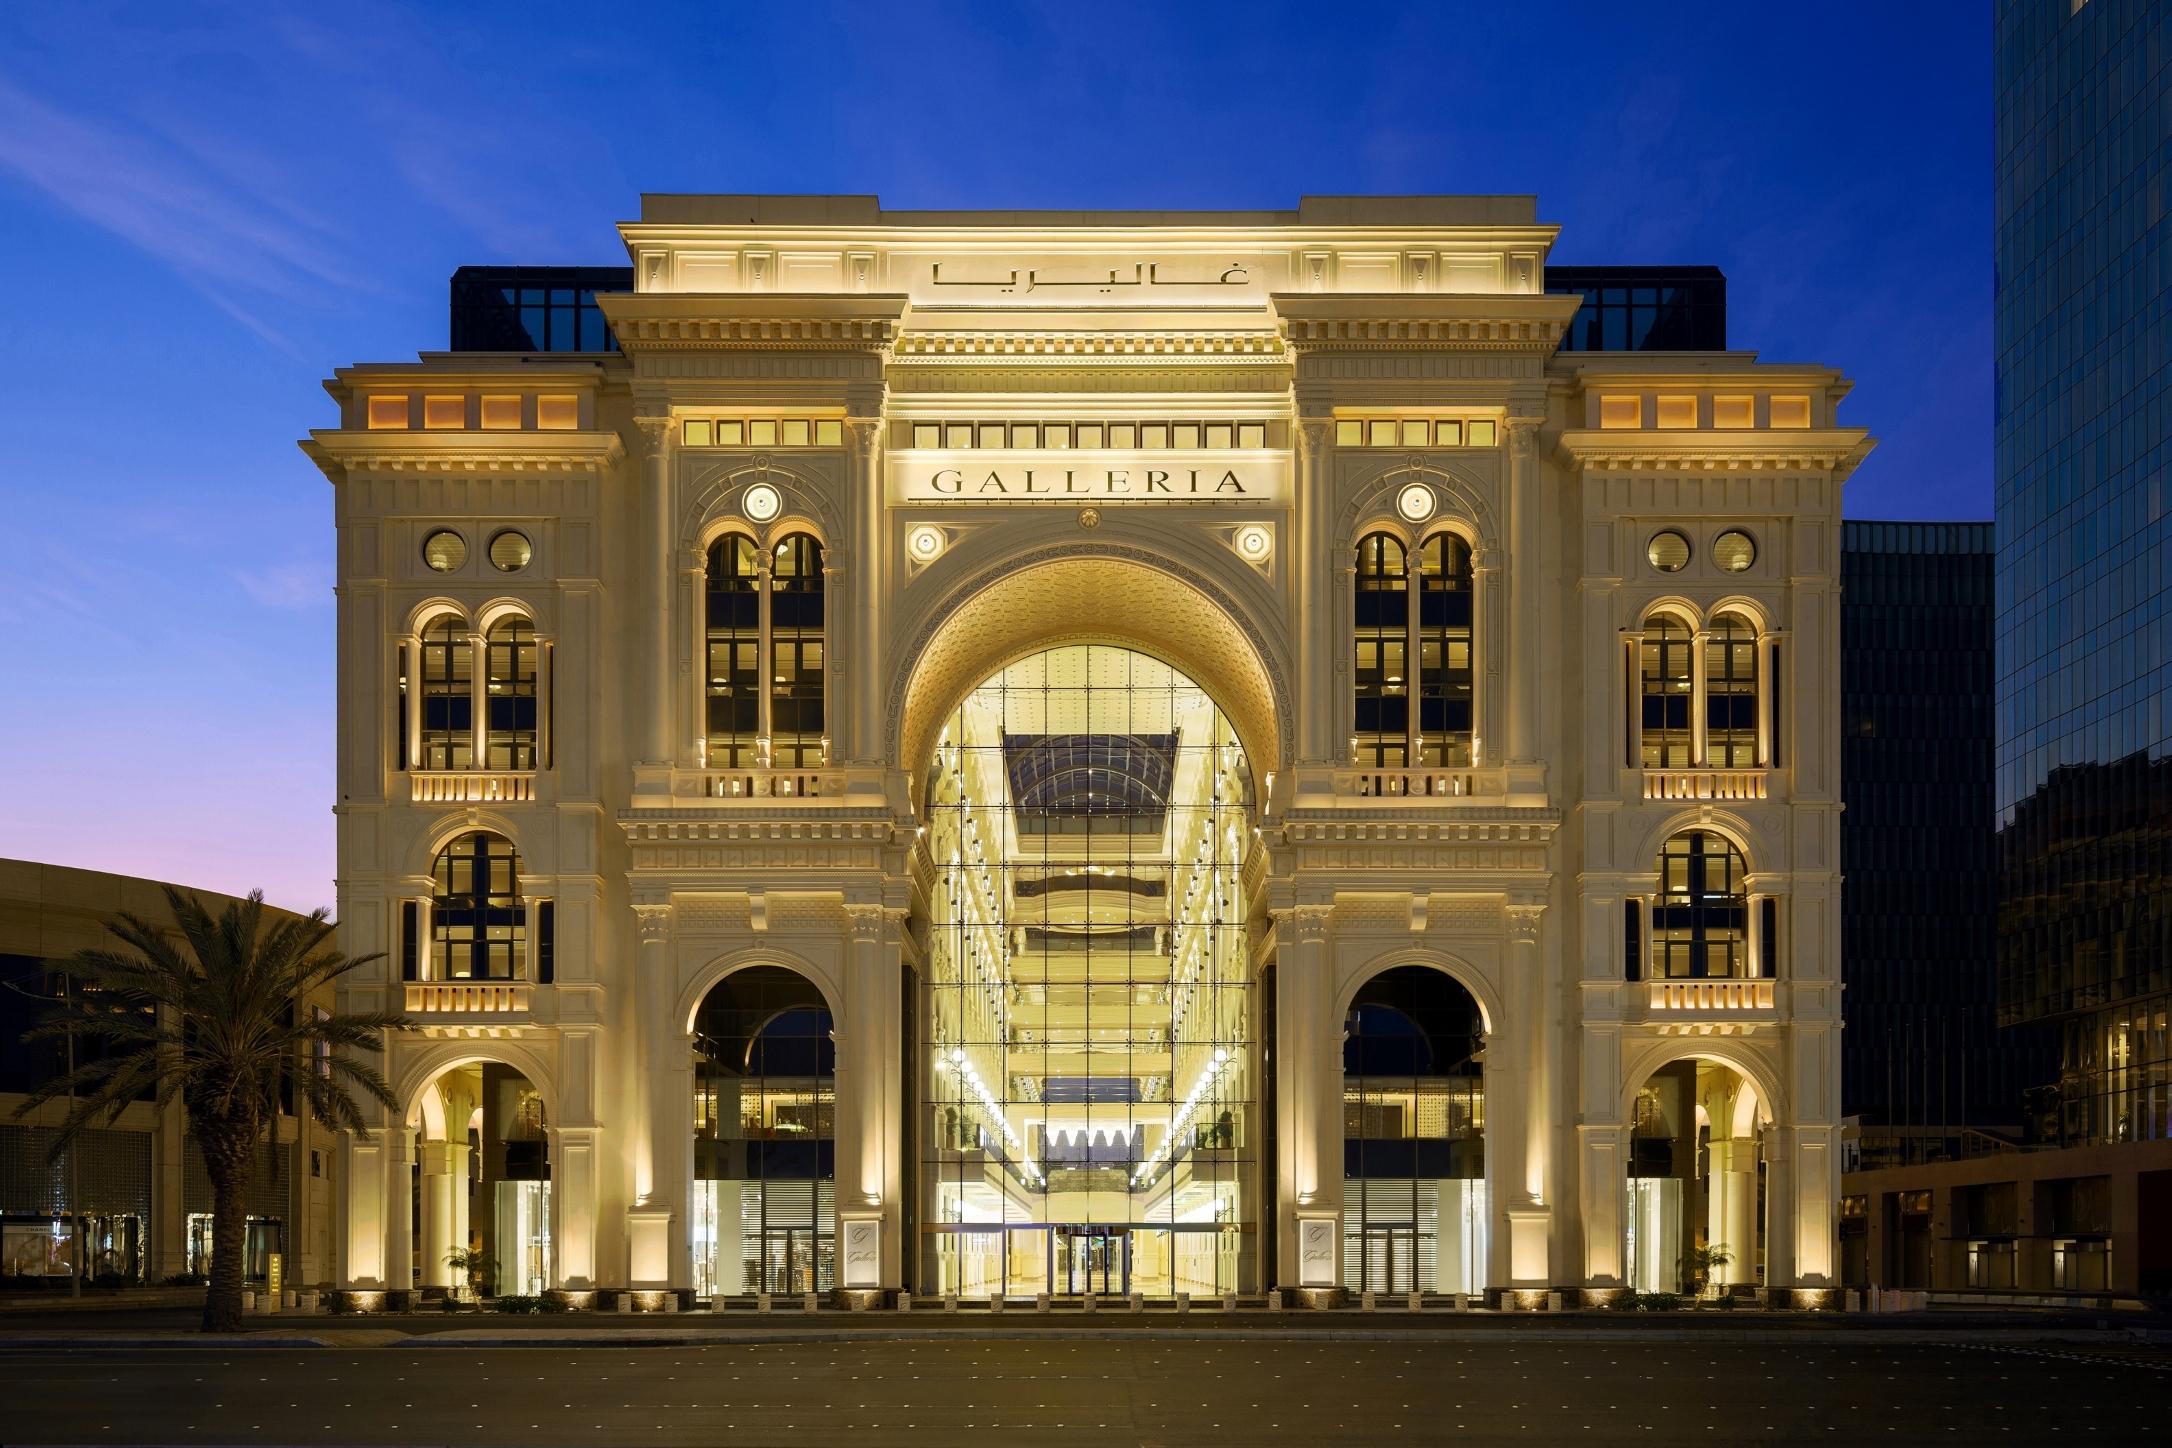 hotel galleria, elaf, jeddah, luxury, lifestyle, helen siwak, travel, adventure, vancouver, bc, vancity